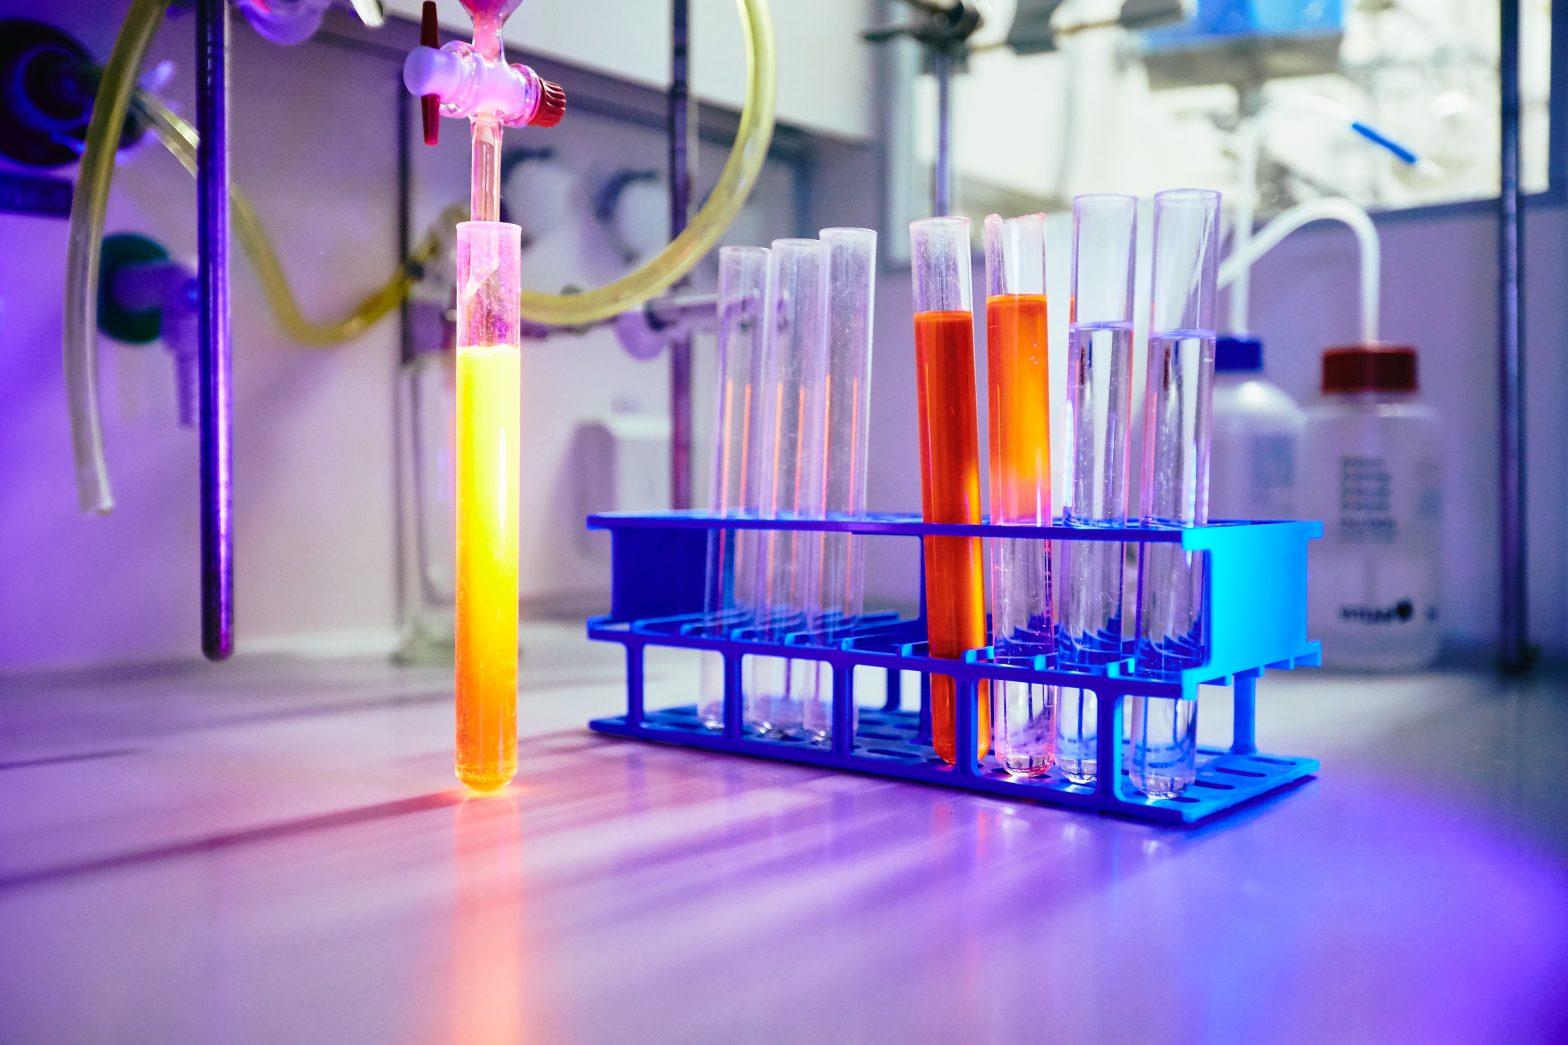 Materials Science laboratory